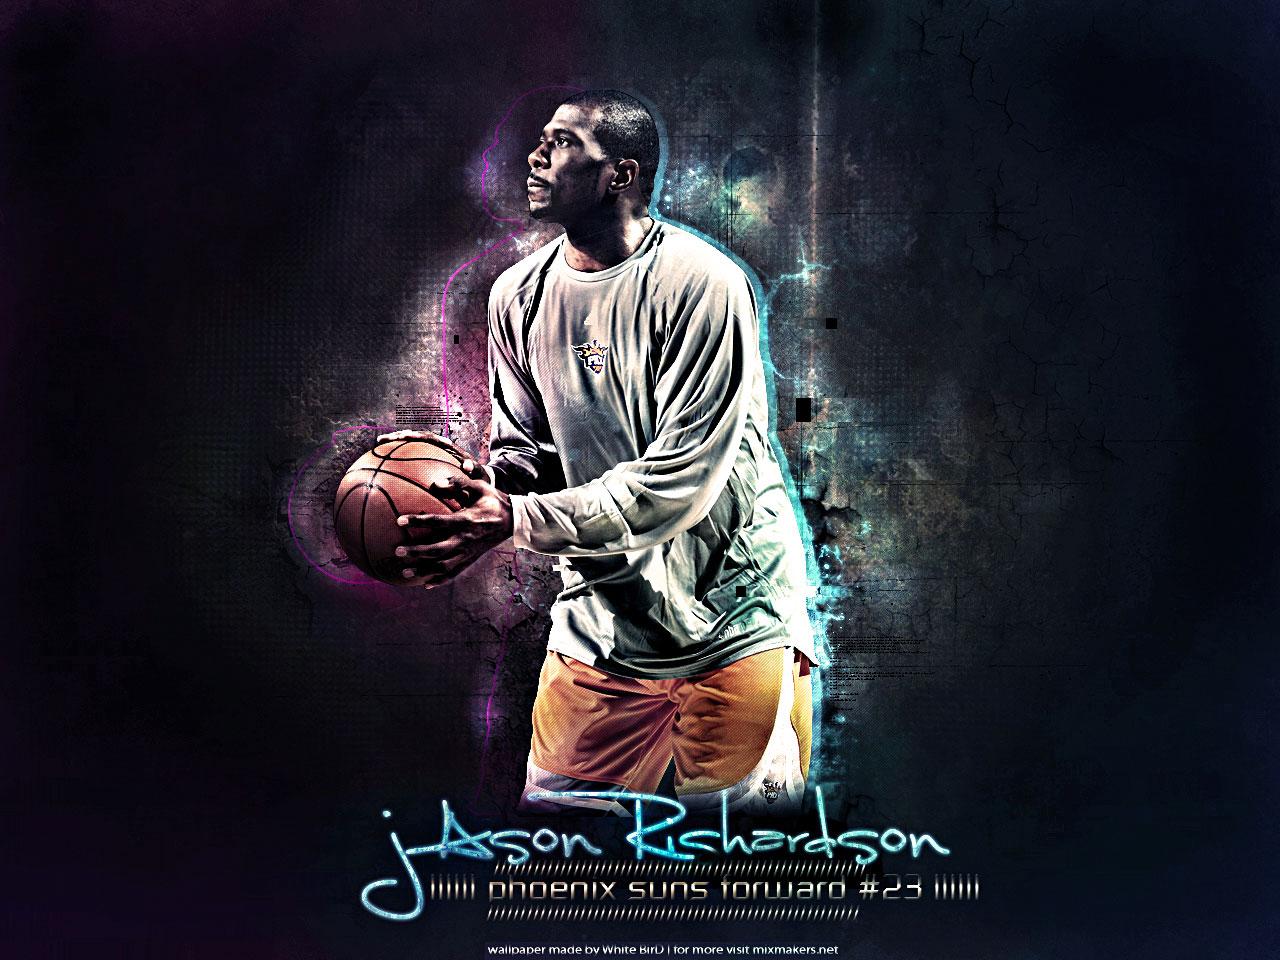 Jason richardson suns wallpaper basketball wallpapers at jason richardson suns wallpaper voltagebd Image collections